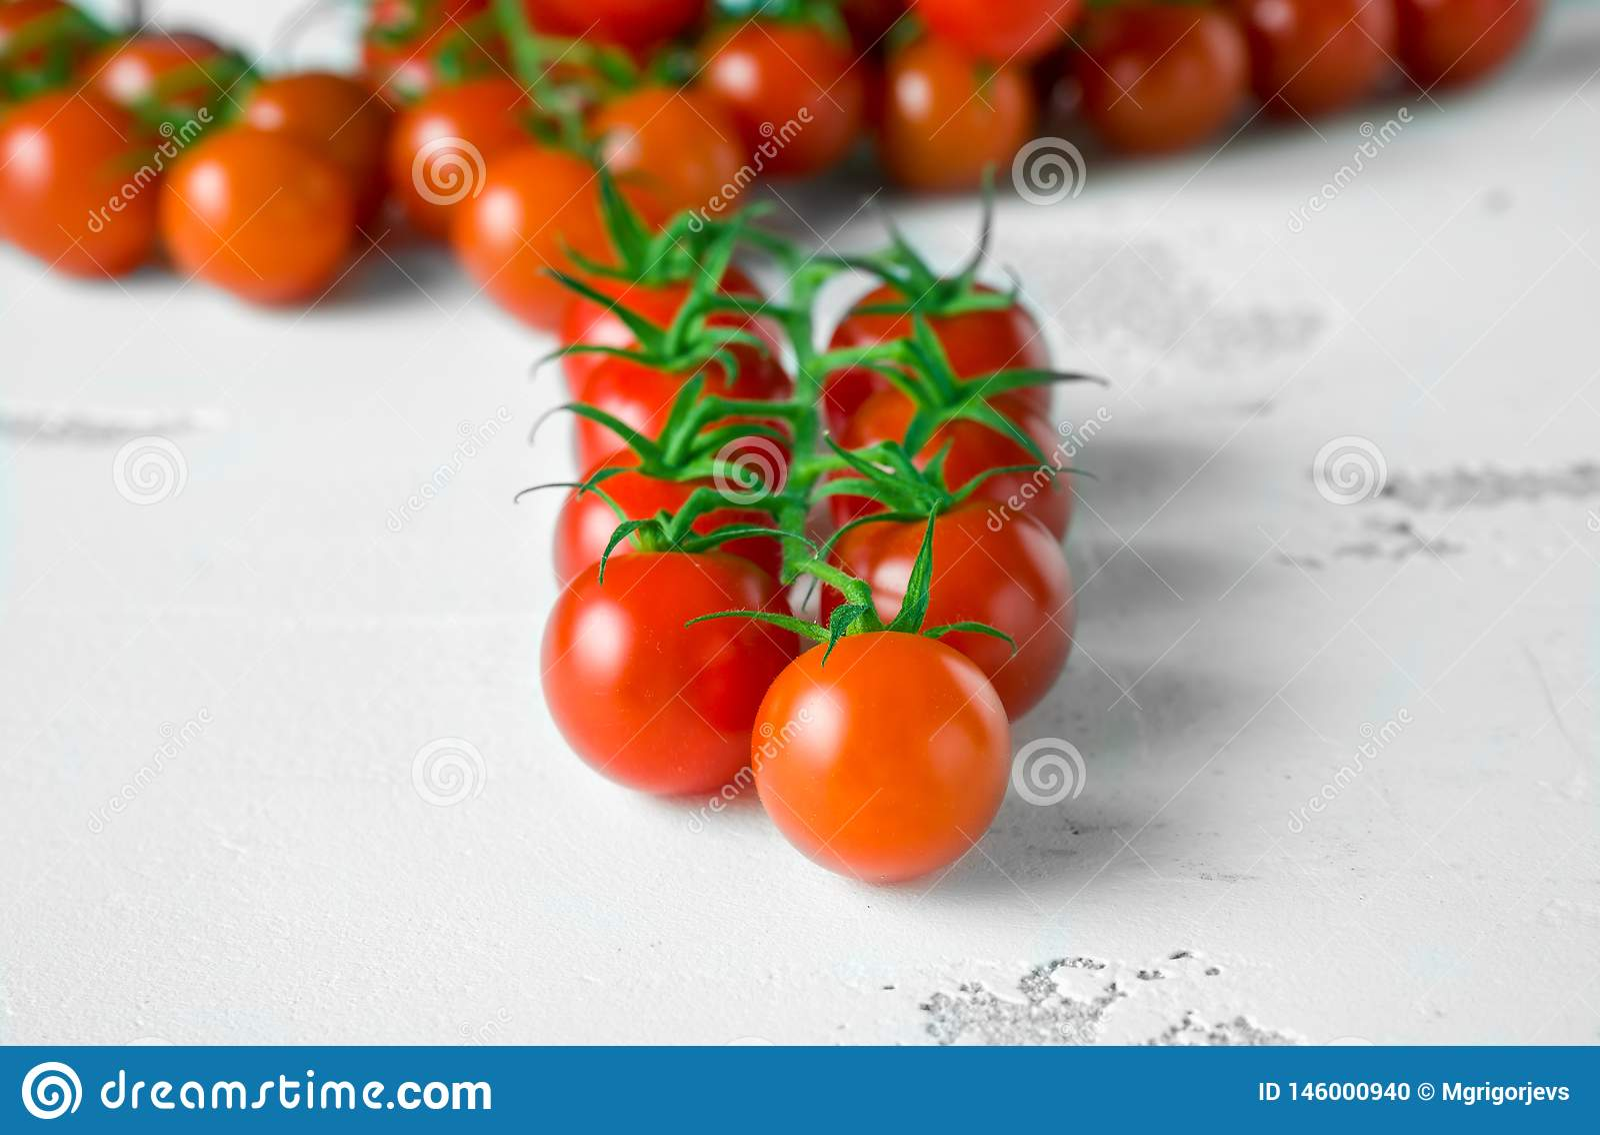 Fresh organic cherry tomatoes on white table